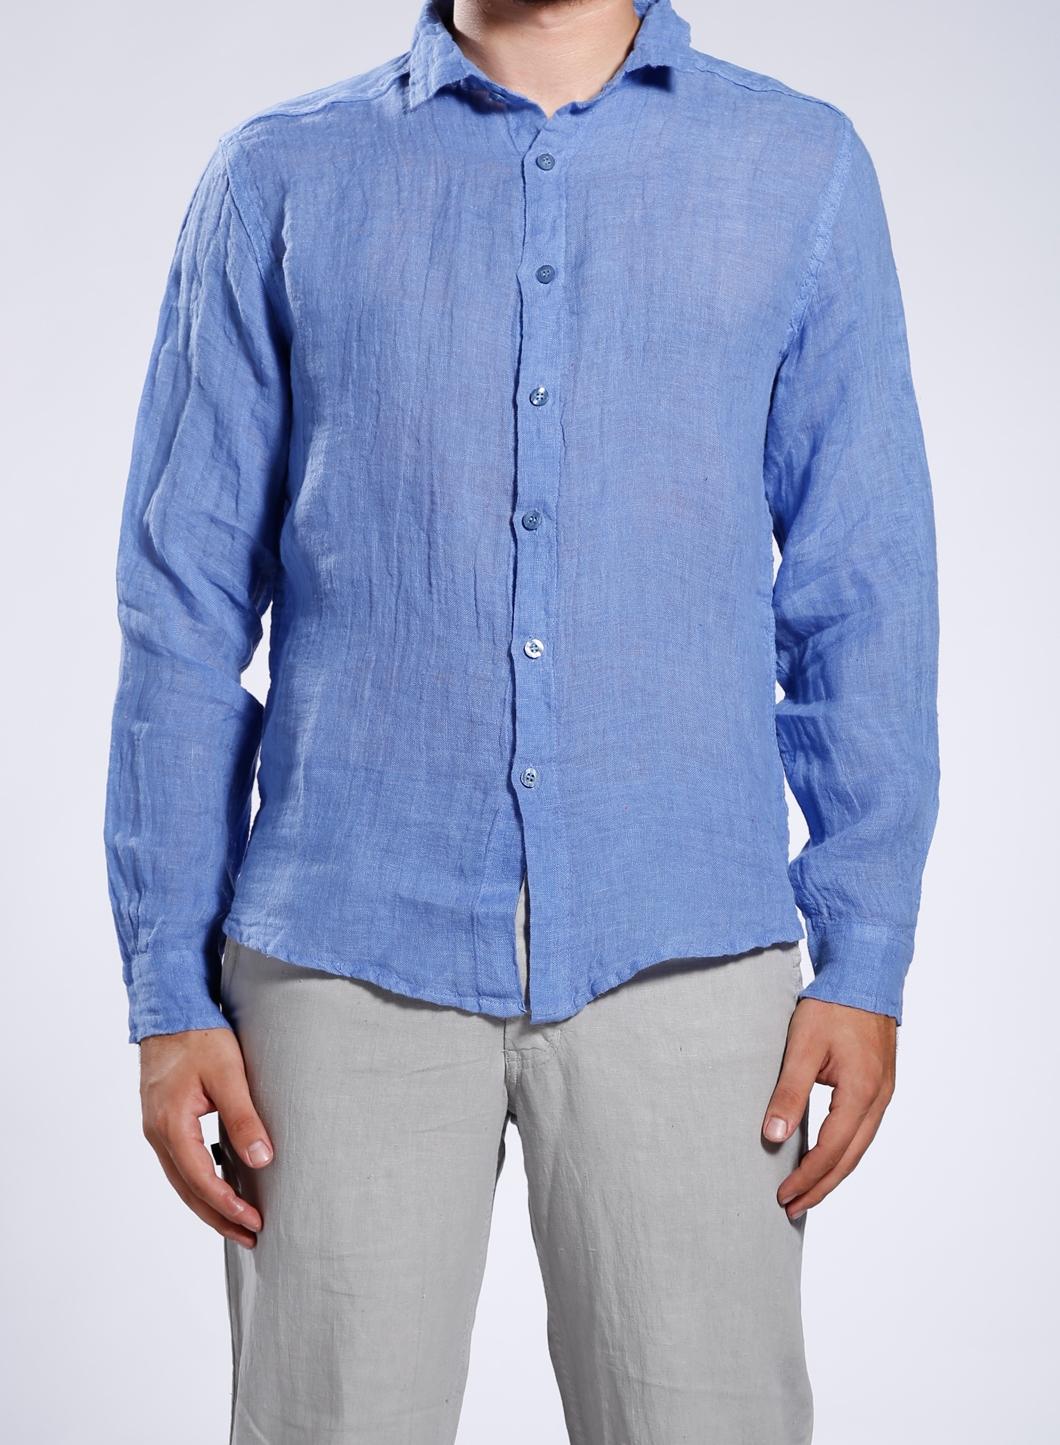 Cream Color Linen Shirt